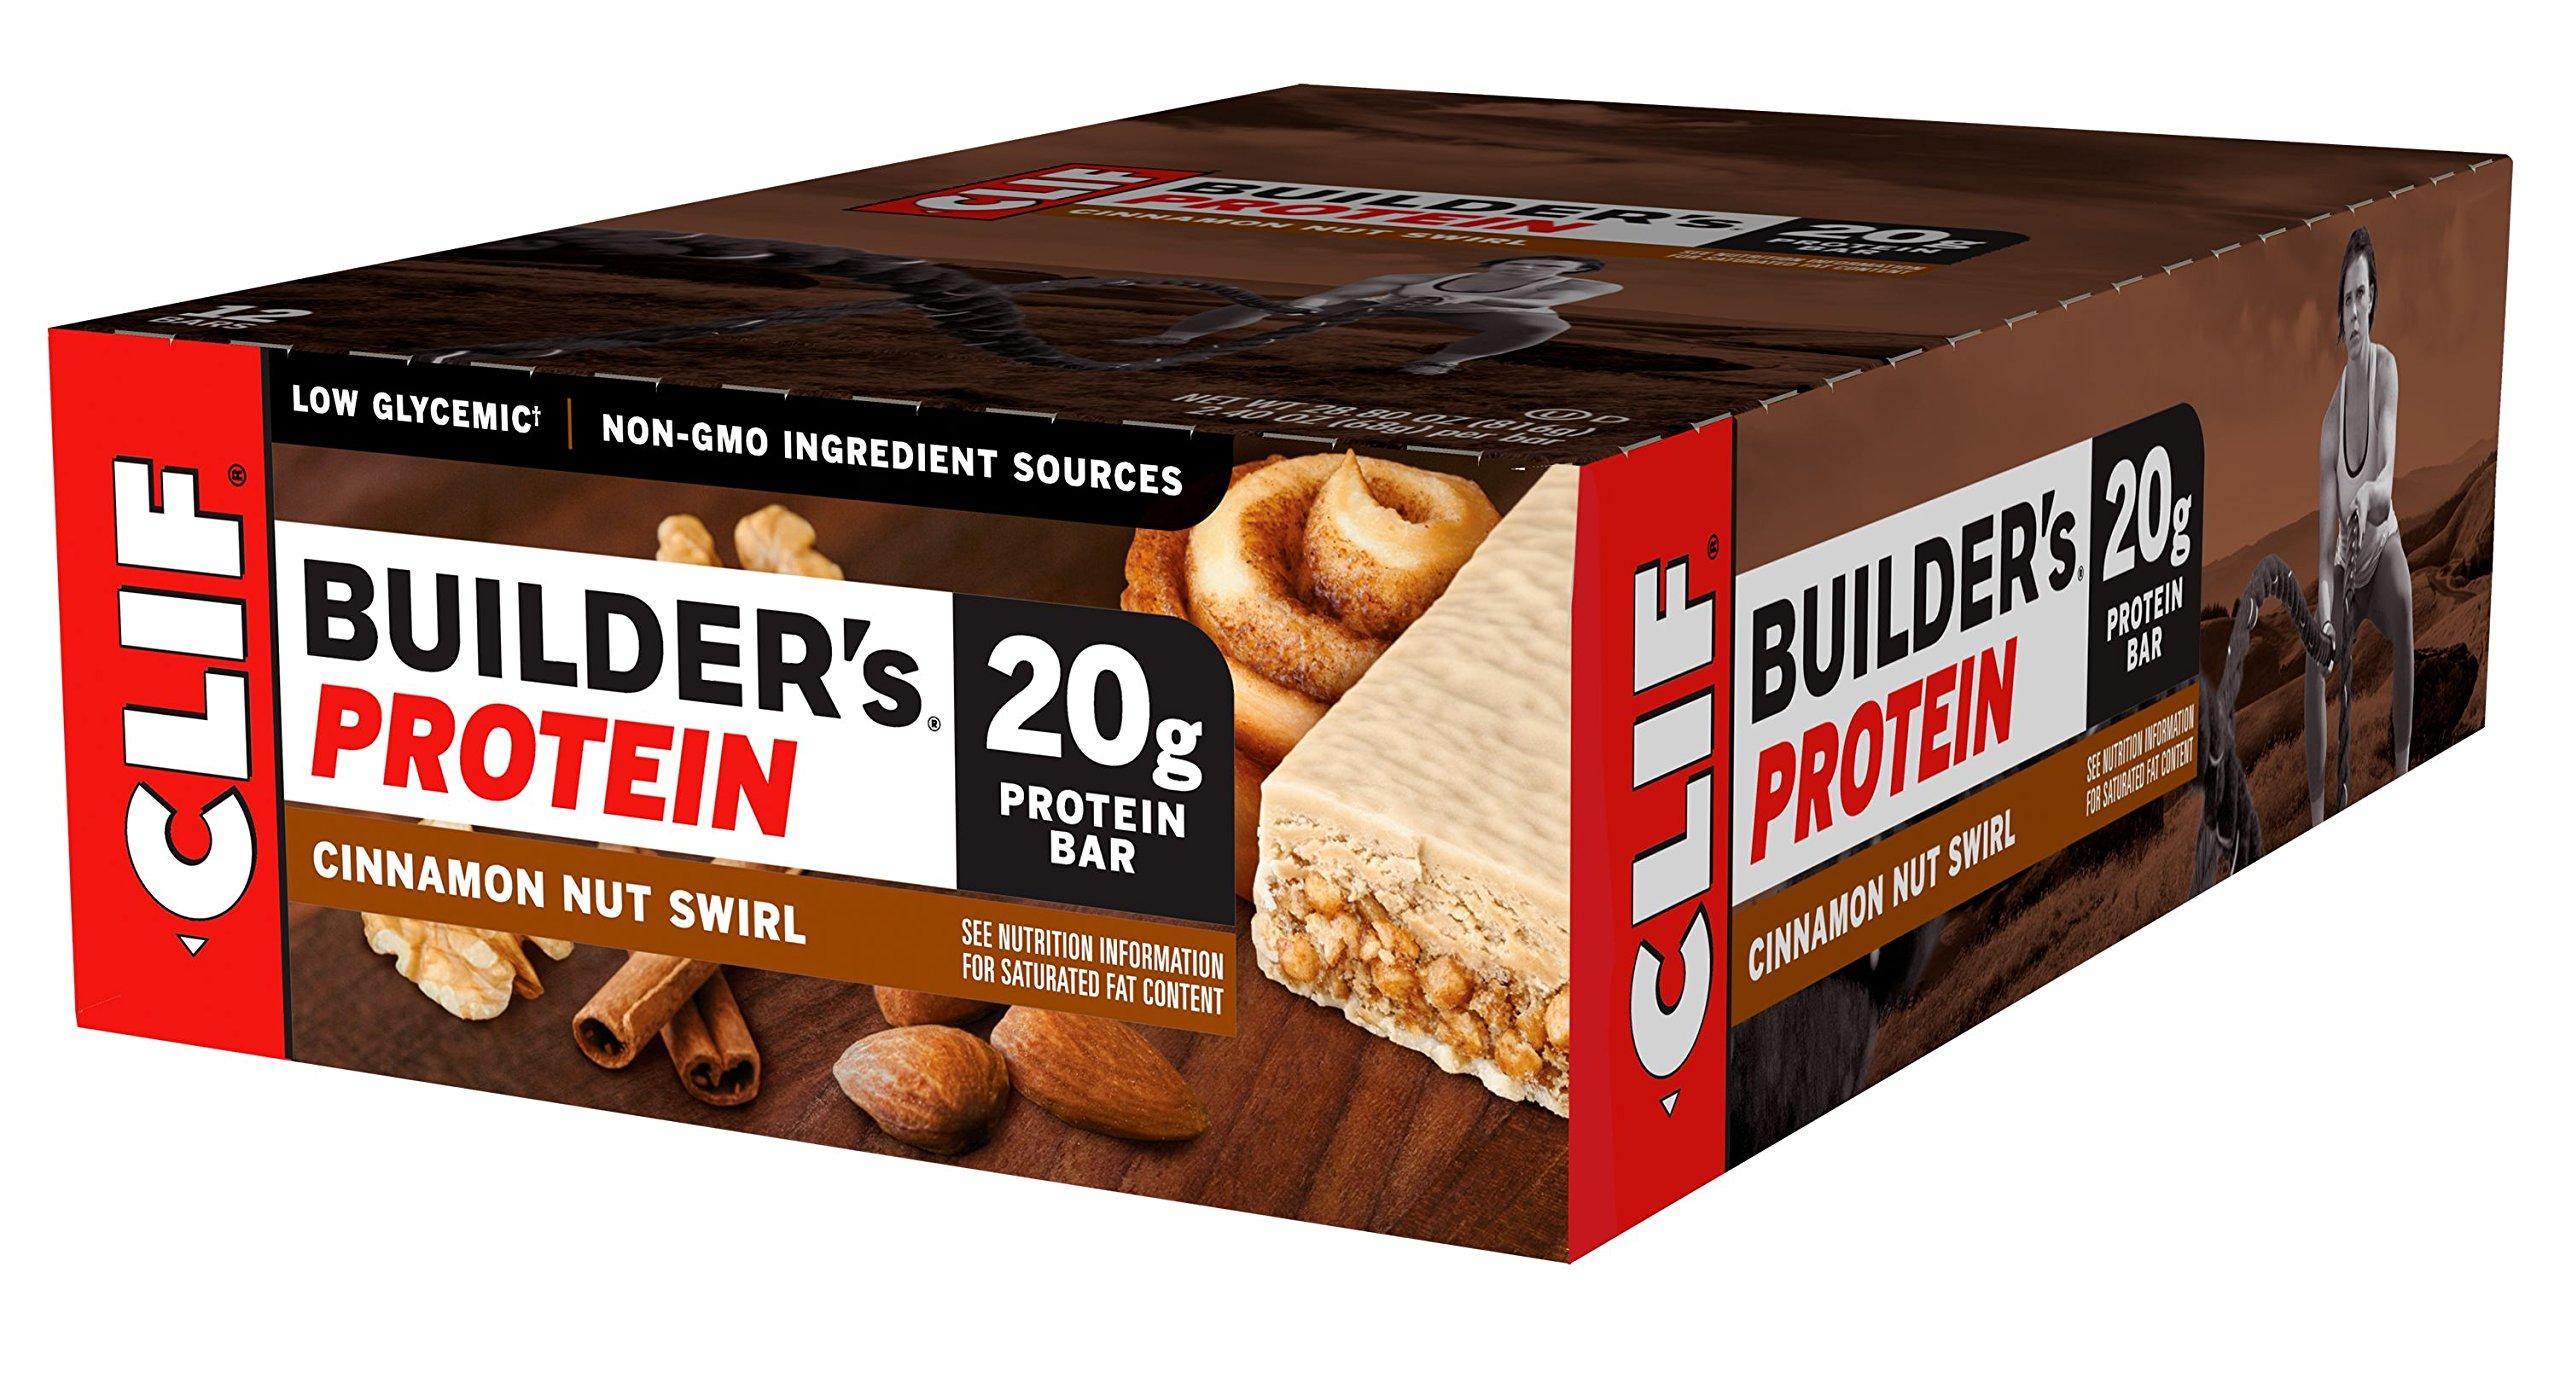 CLIF BUILDER'S - Protein Bar - Cinnamon Nut Swirl - (2.4 Ounce Non-GMO Bar, 12 Count)